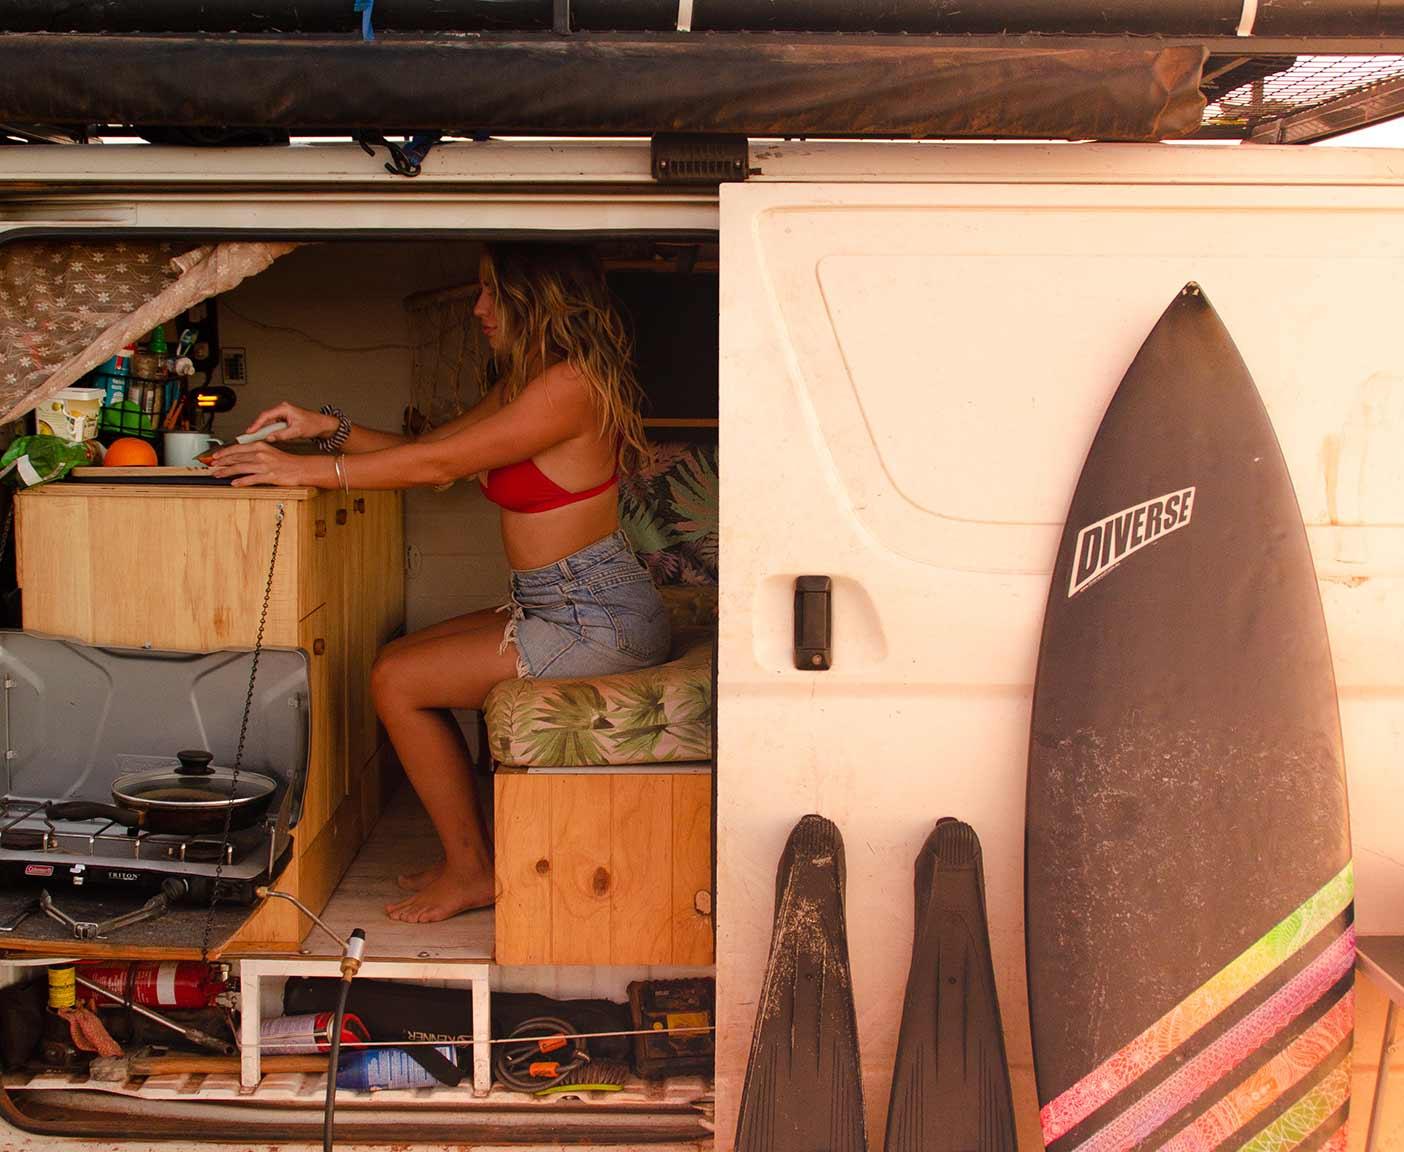 Toyota-hiace-camper-4x4-van-camping-surfer-vanlife-australia